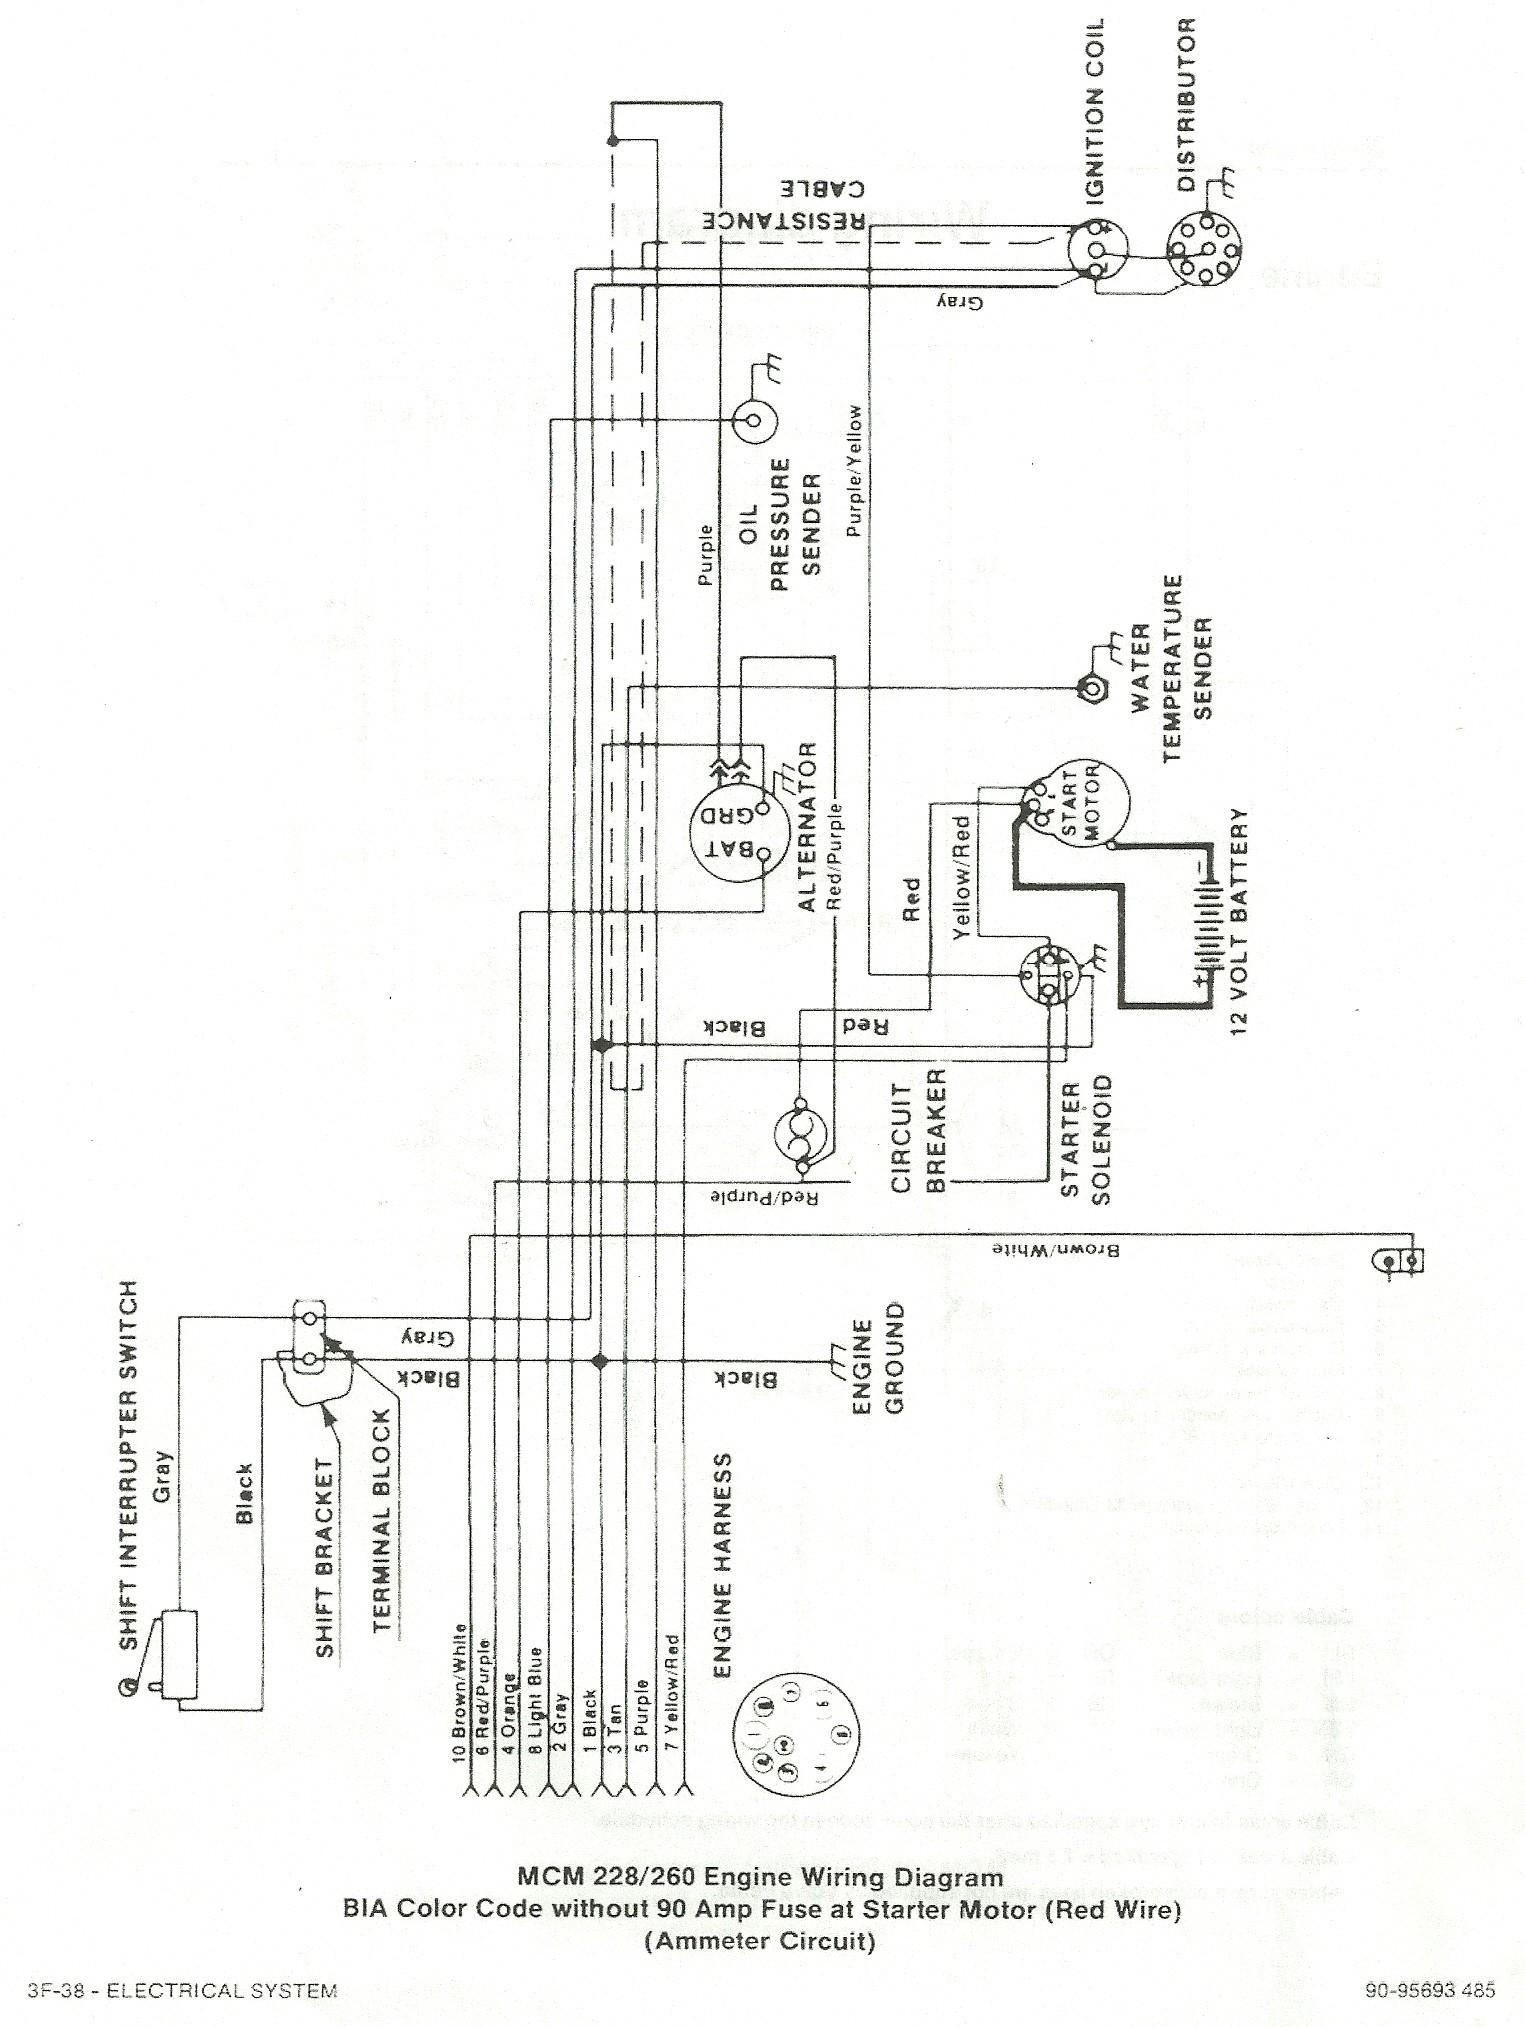 Wiring Diagram Mercruiser Alternator New Car 165 Mercruiser Starter Wiring Diagram Wiring Harness and